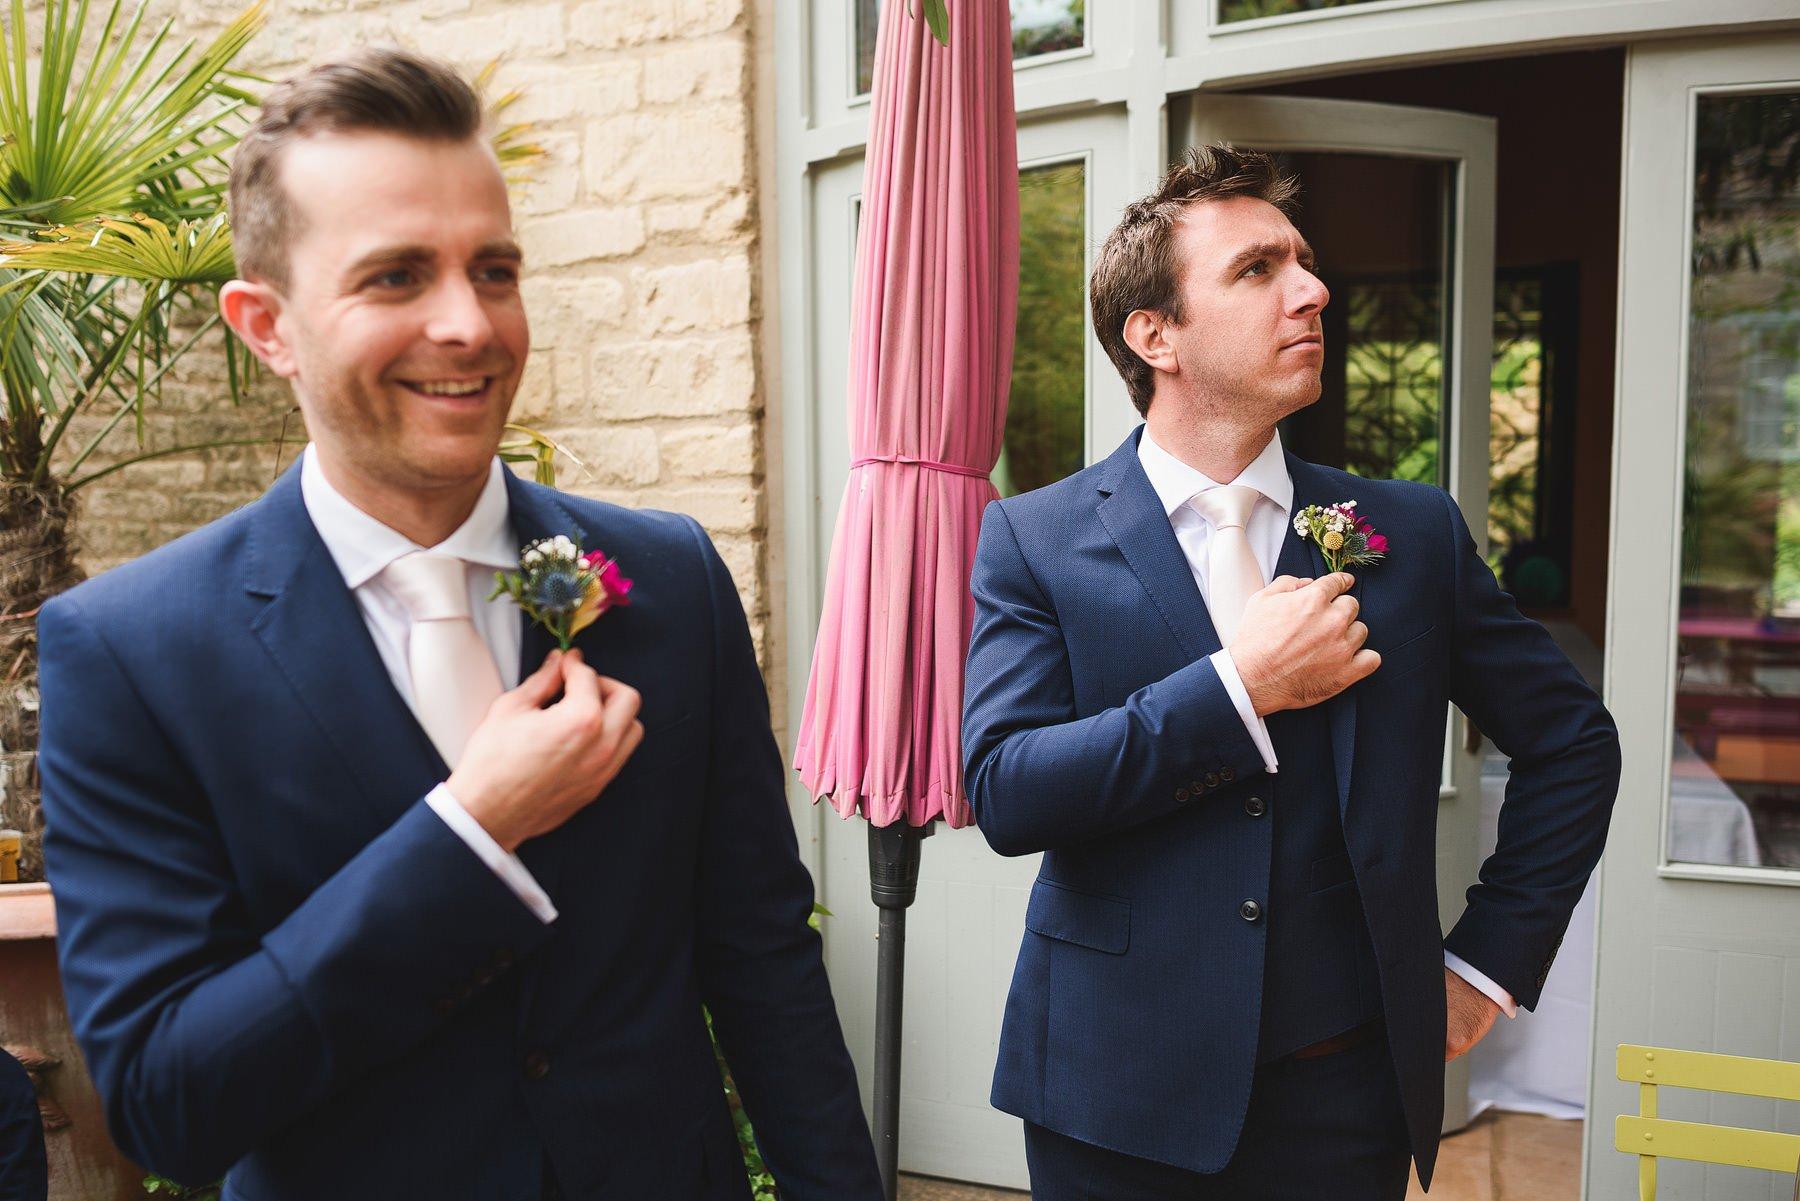 matara centre wedding photographers 2018